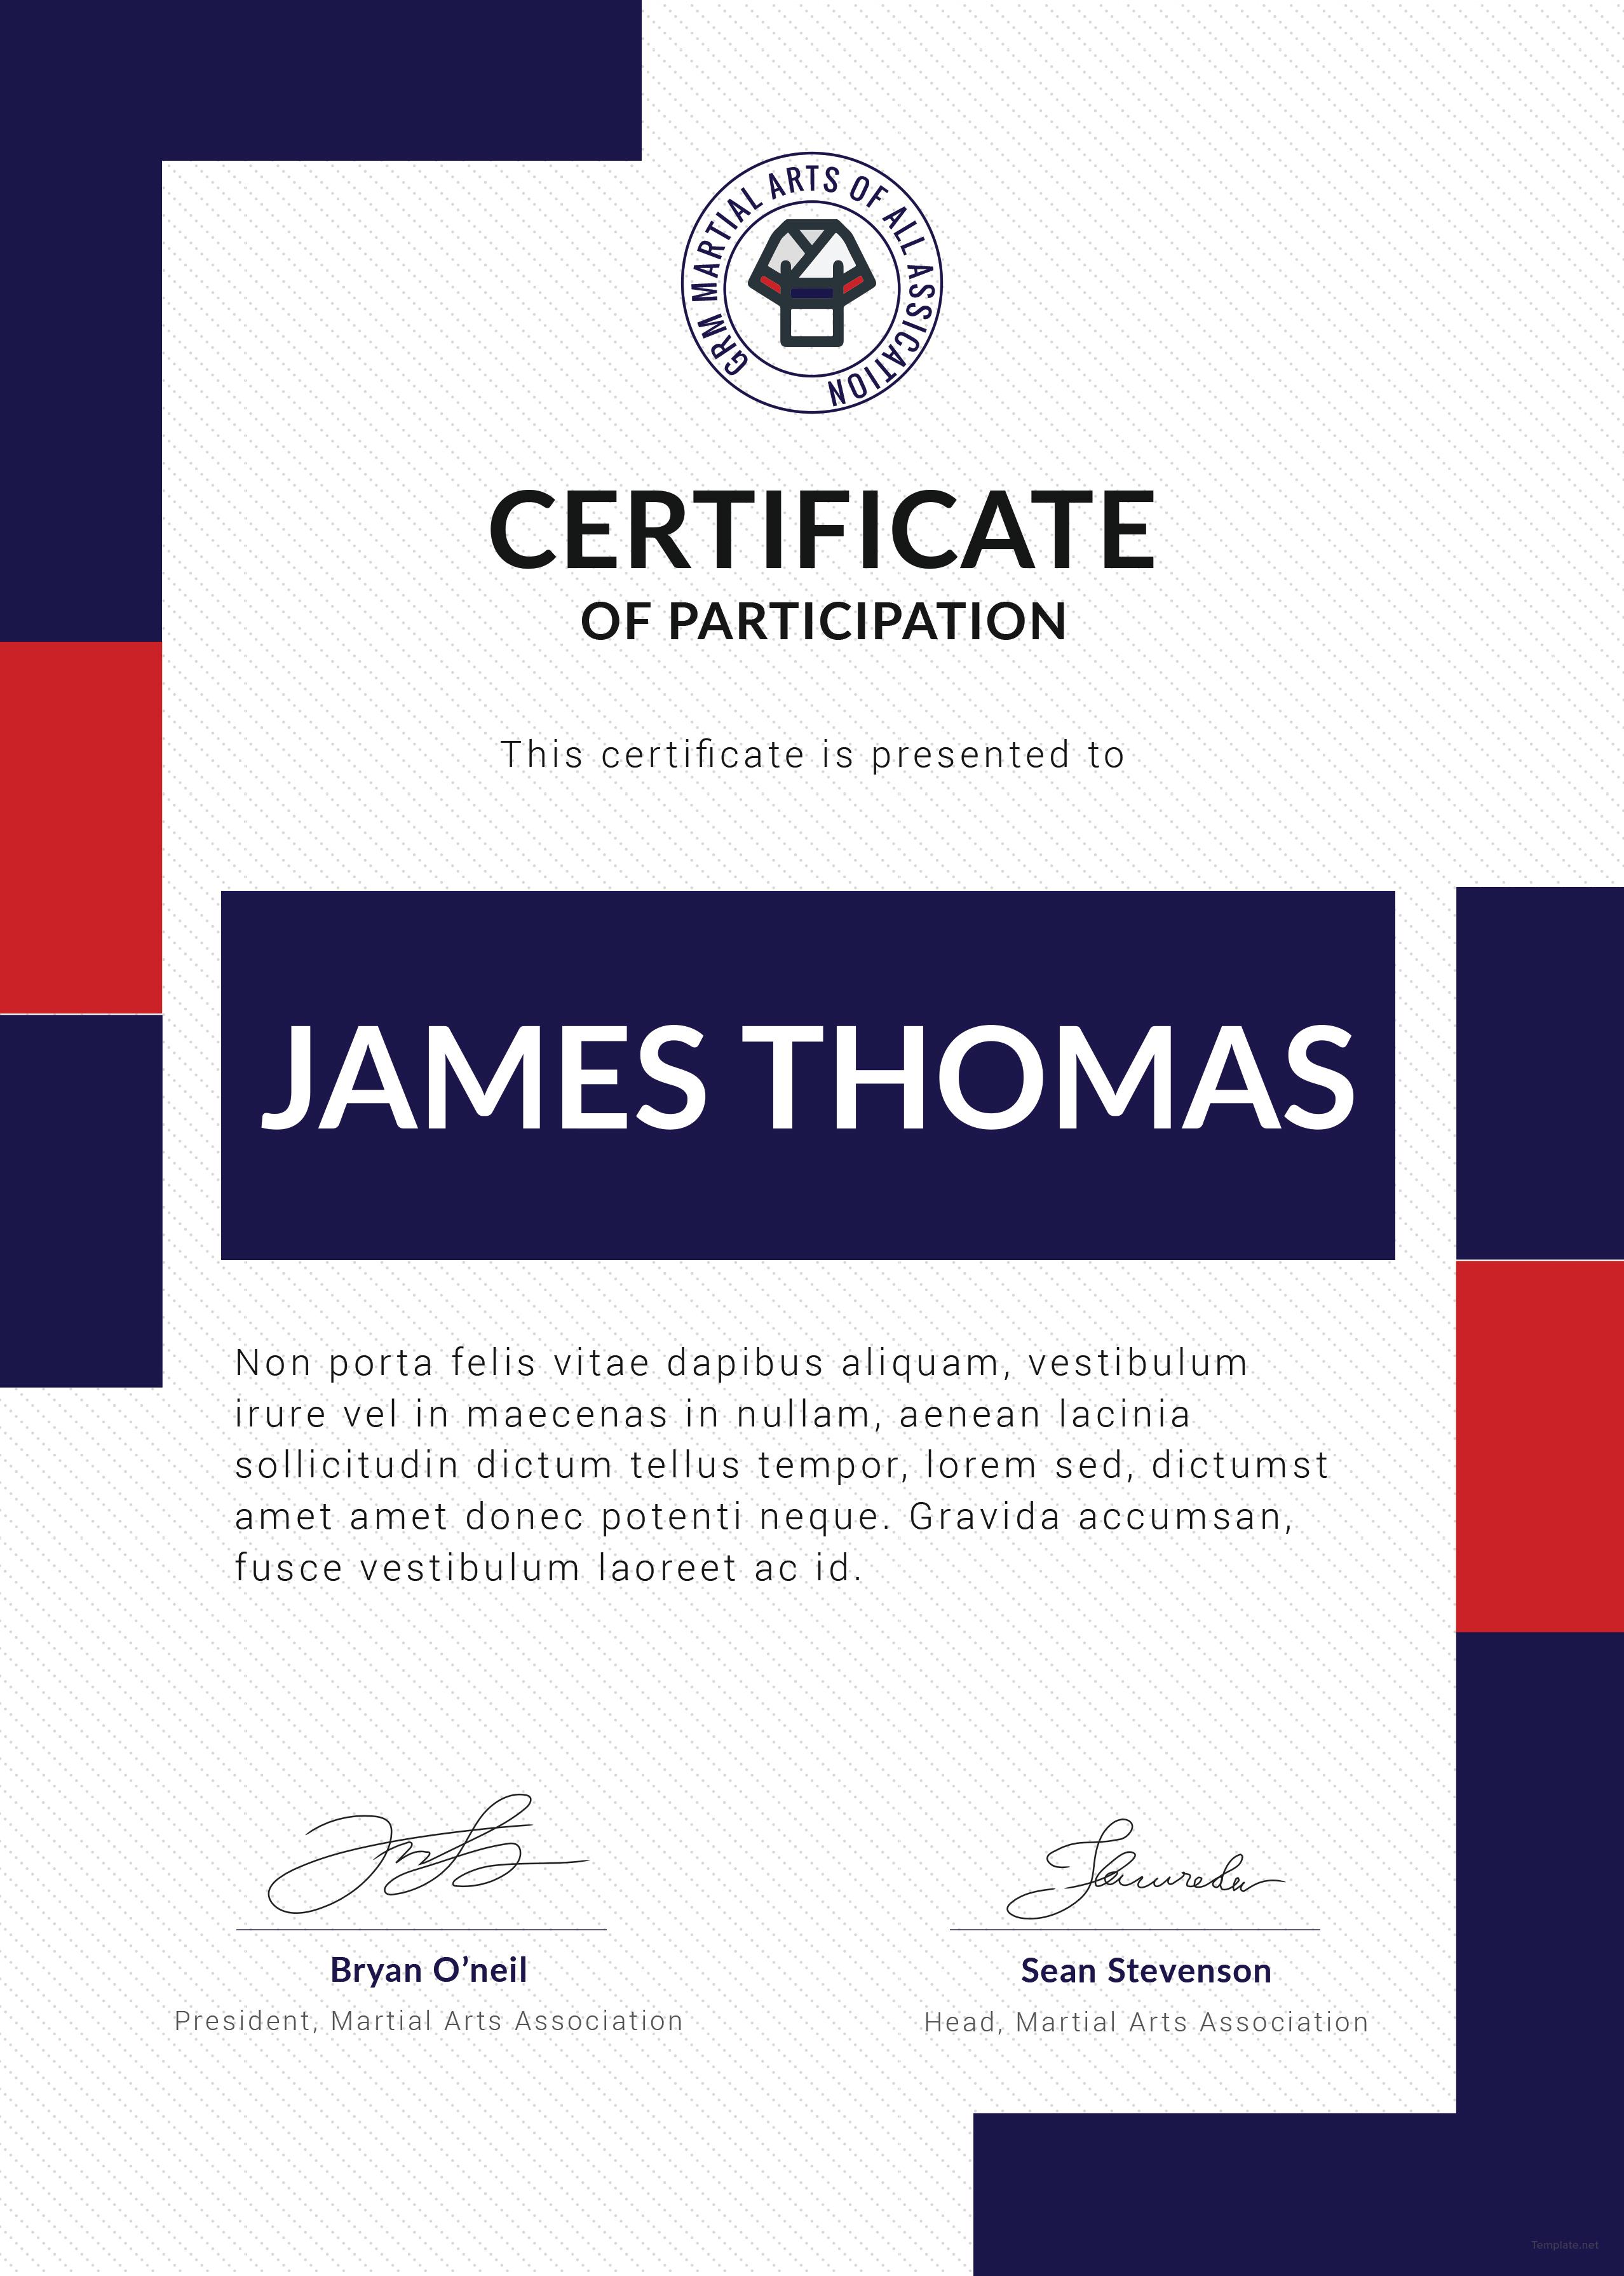 martial arts event winner certificate template free dinocro info